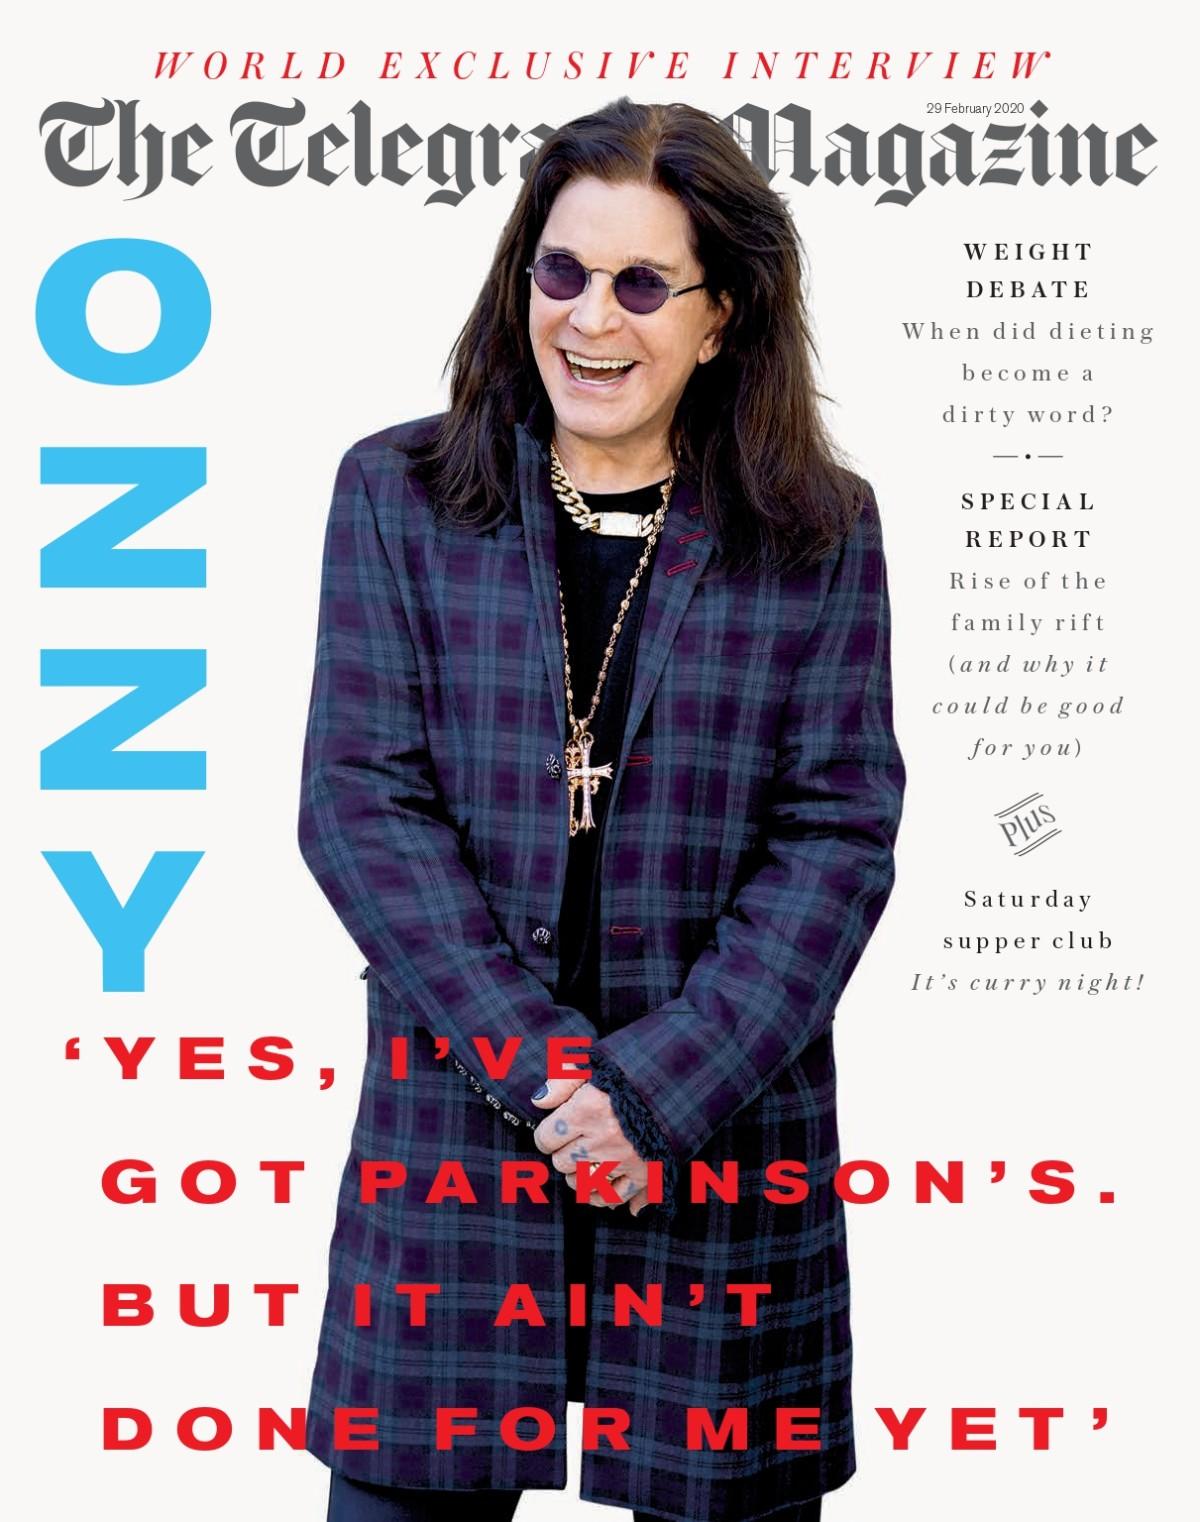 Ozzy Osbourne The Telegraph Magazine February 29, 2020